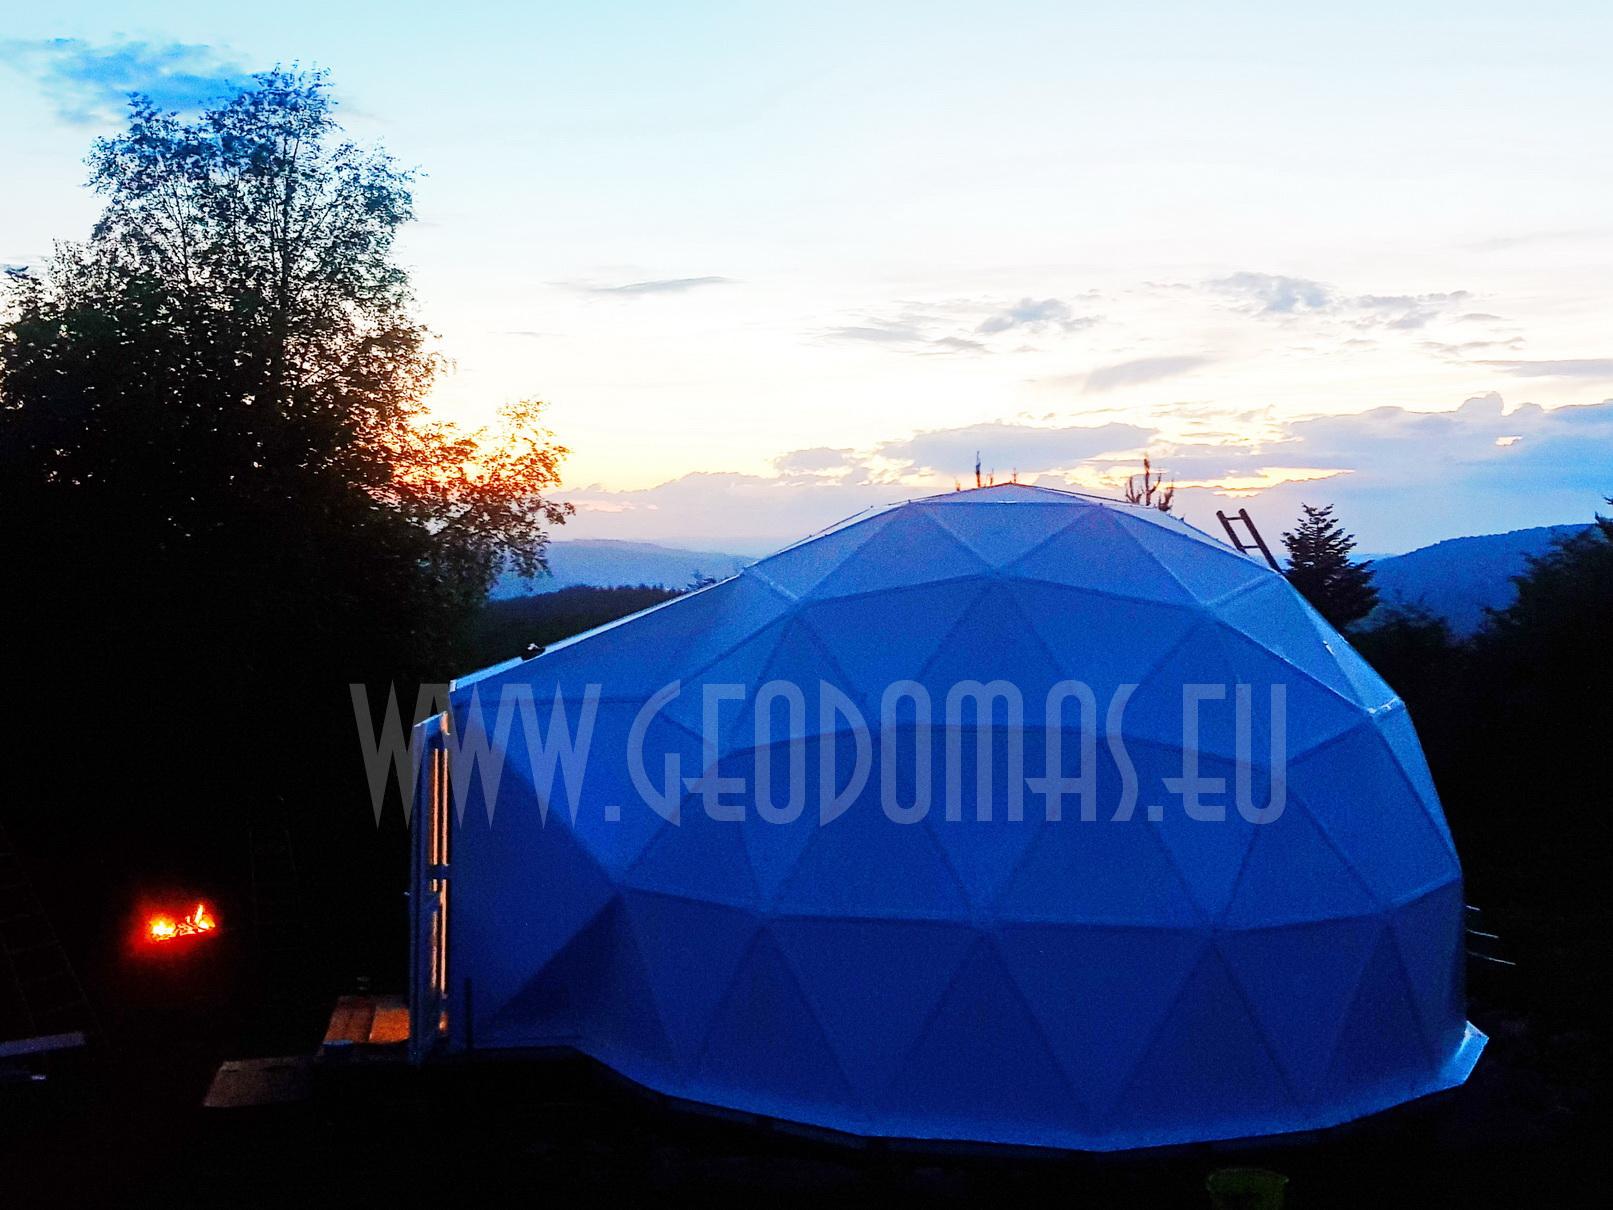 30m² LUXURY GLAMPING  Ø6m Dome  | Sandwich panel & Glass FAÇADE